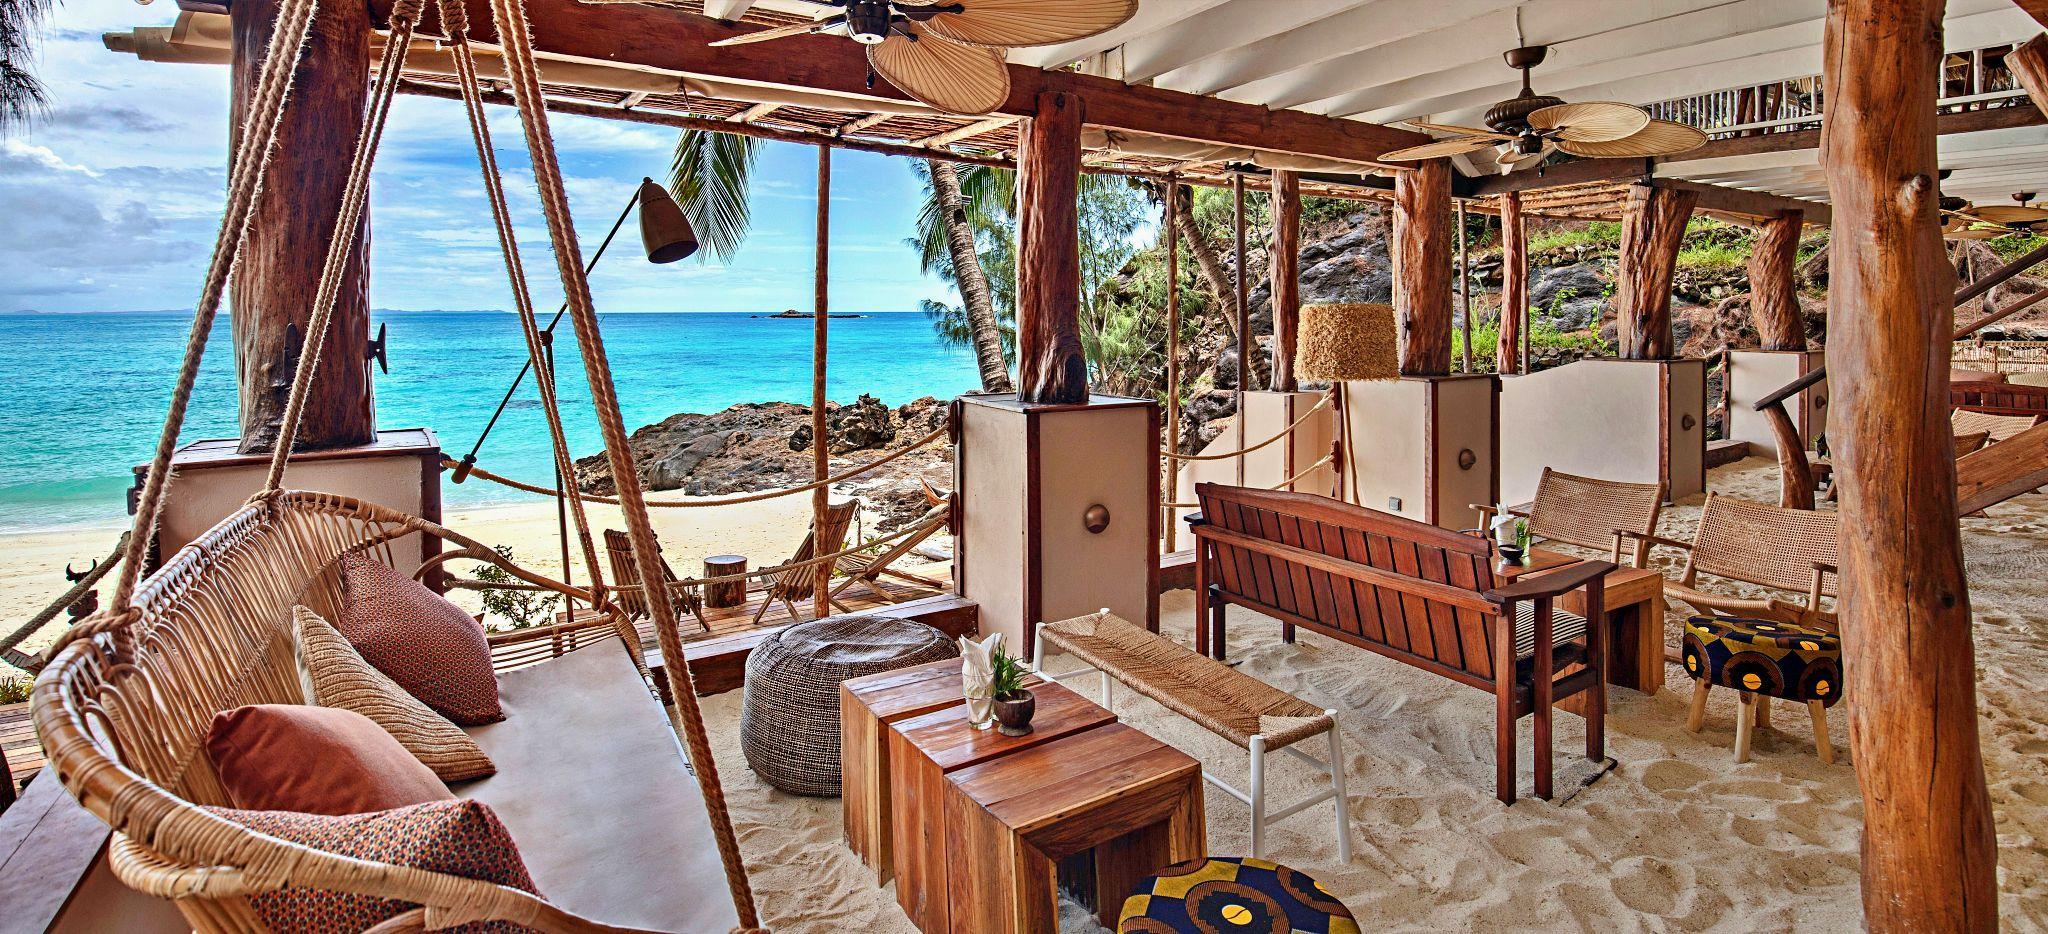 Die Bar des Constance Tsara Banjina, am Strand